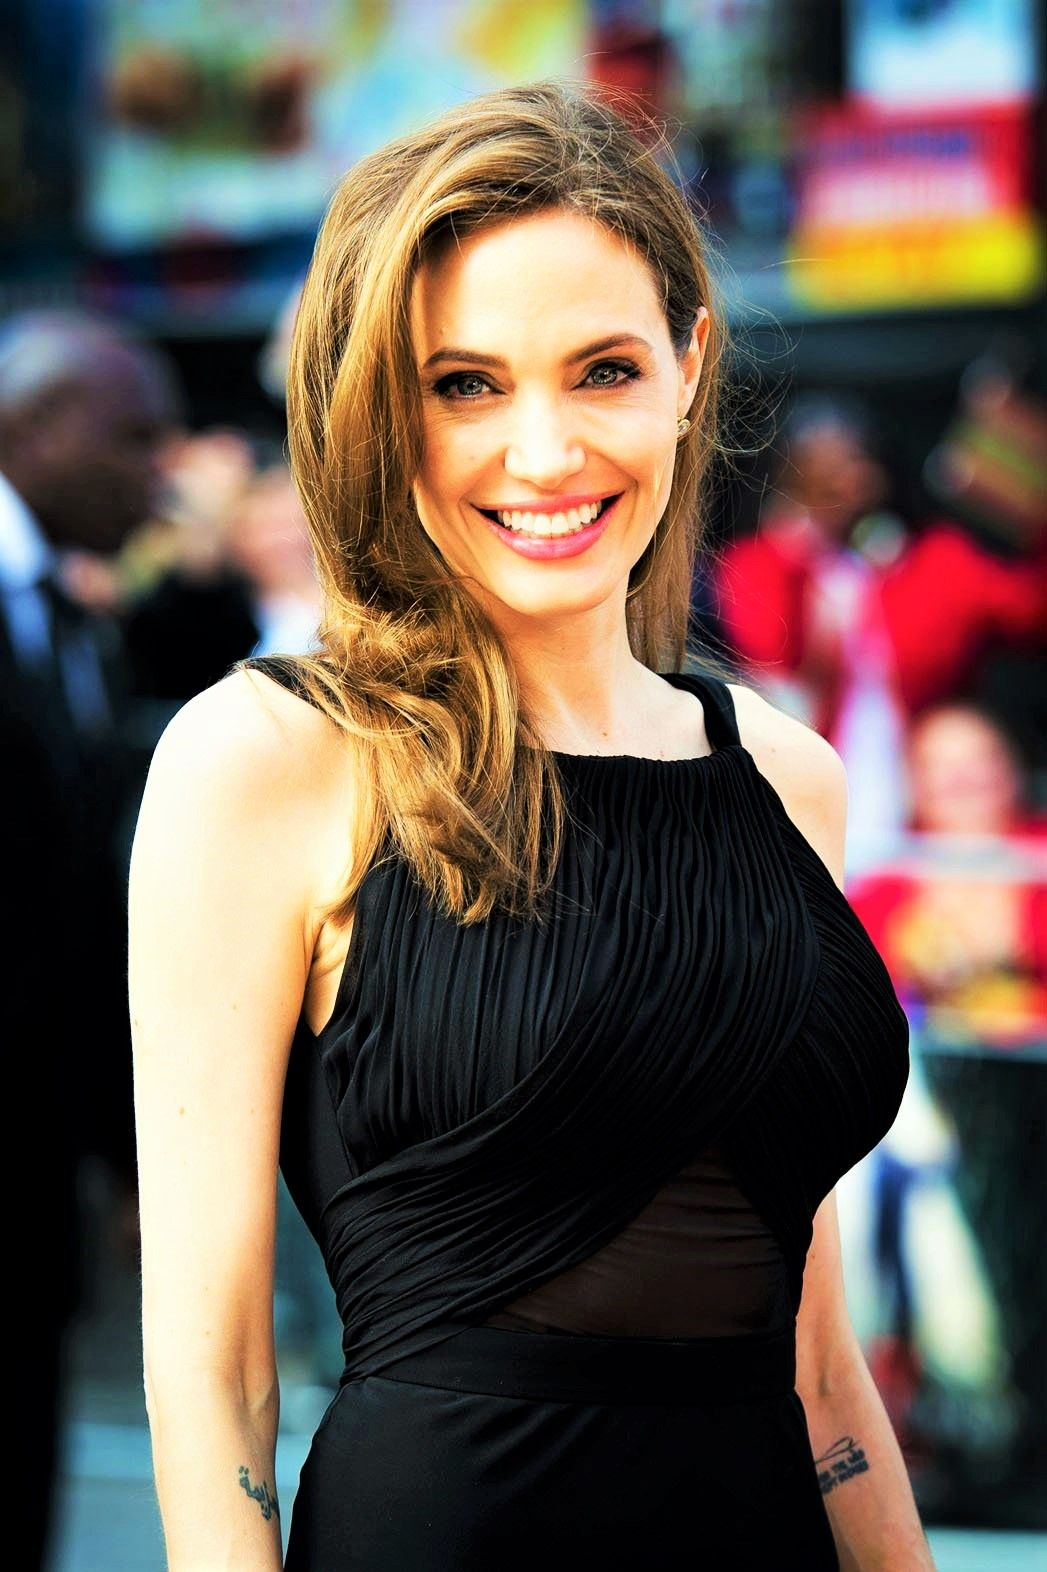 Angelina Jolie Frisuren Promi Frisuren Pinterest Angelina Jolie